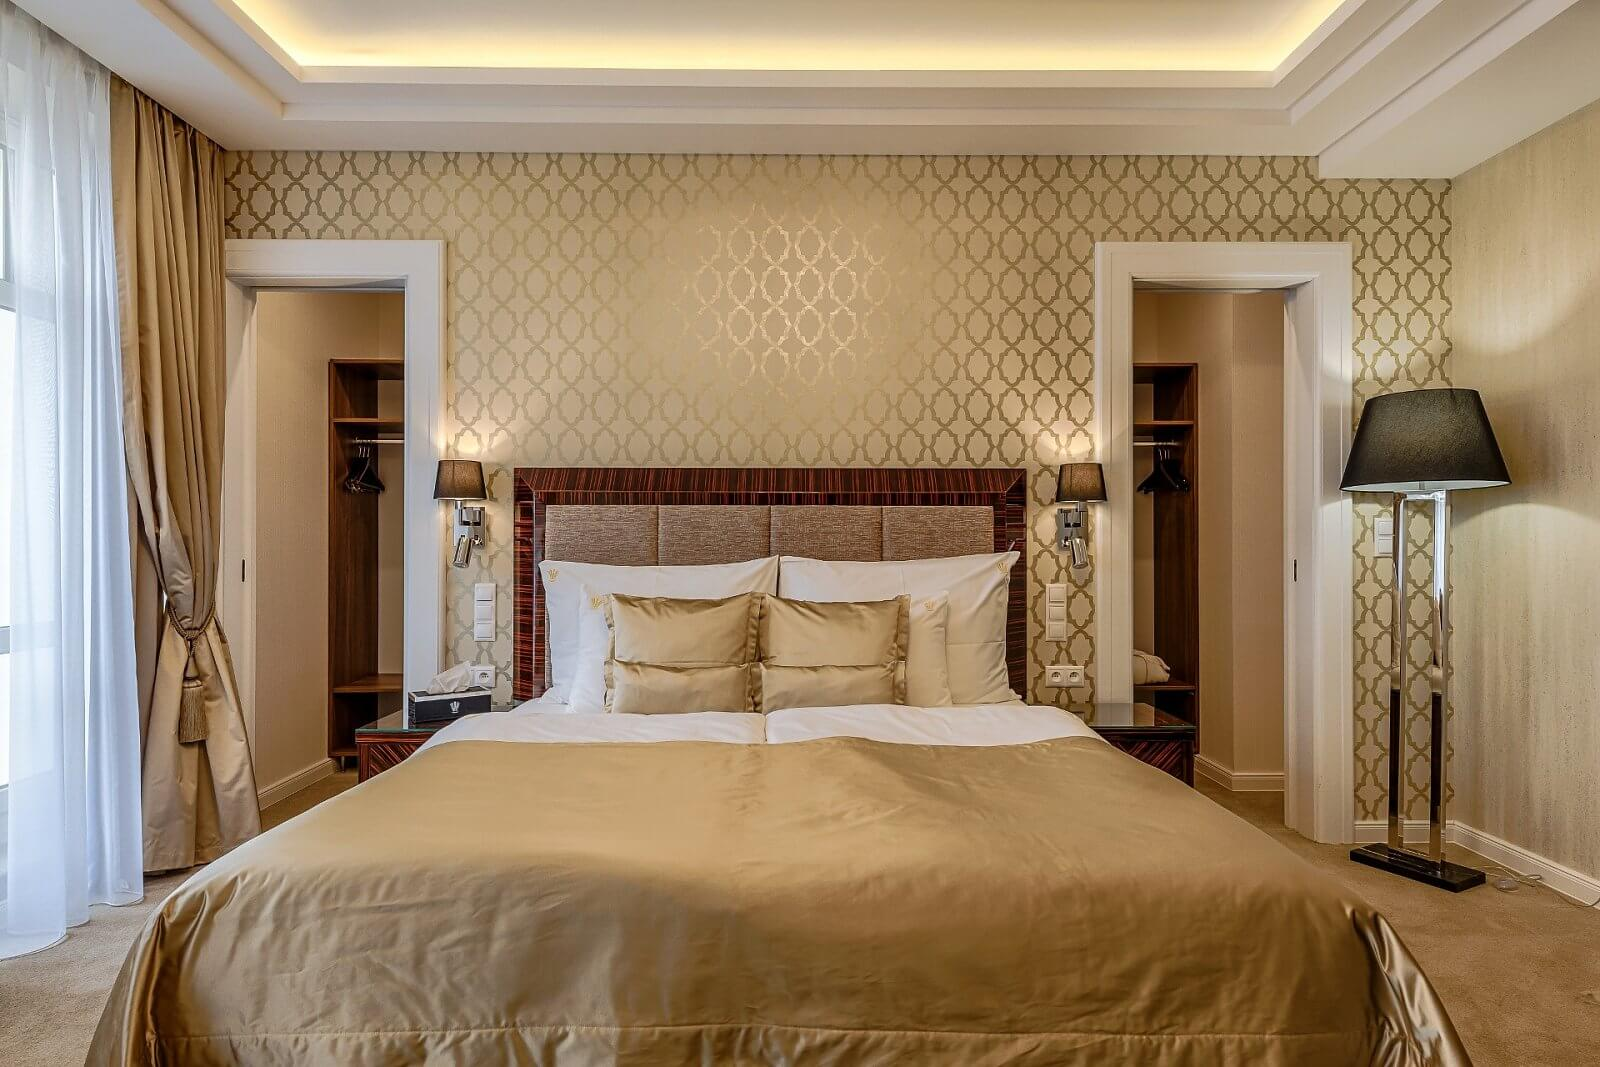 Royal palace izba apartman kupele turcianske teplice